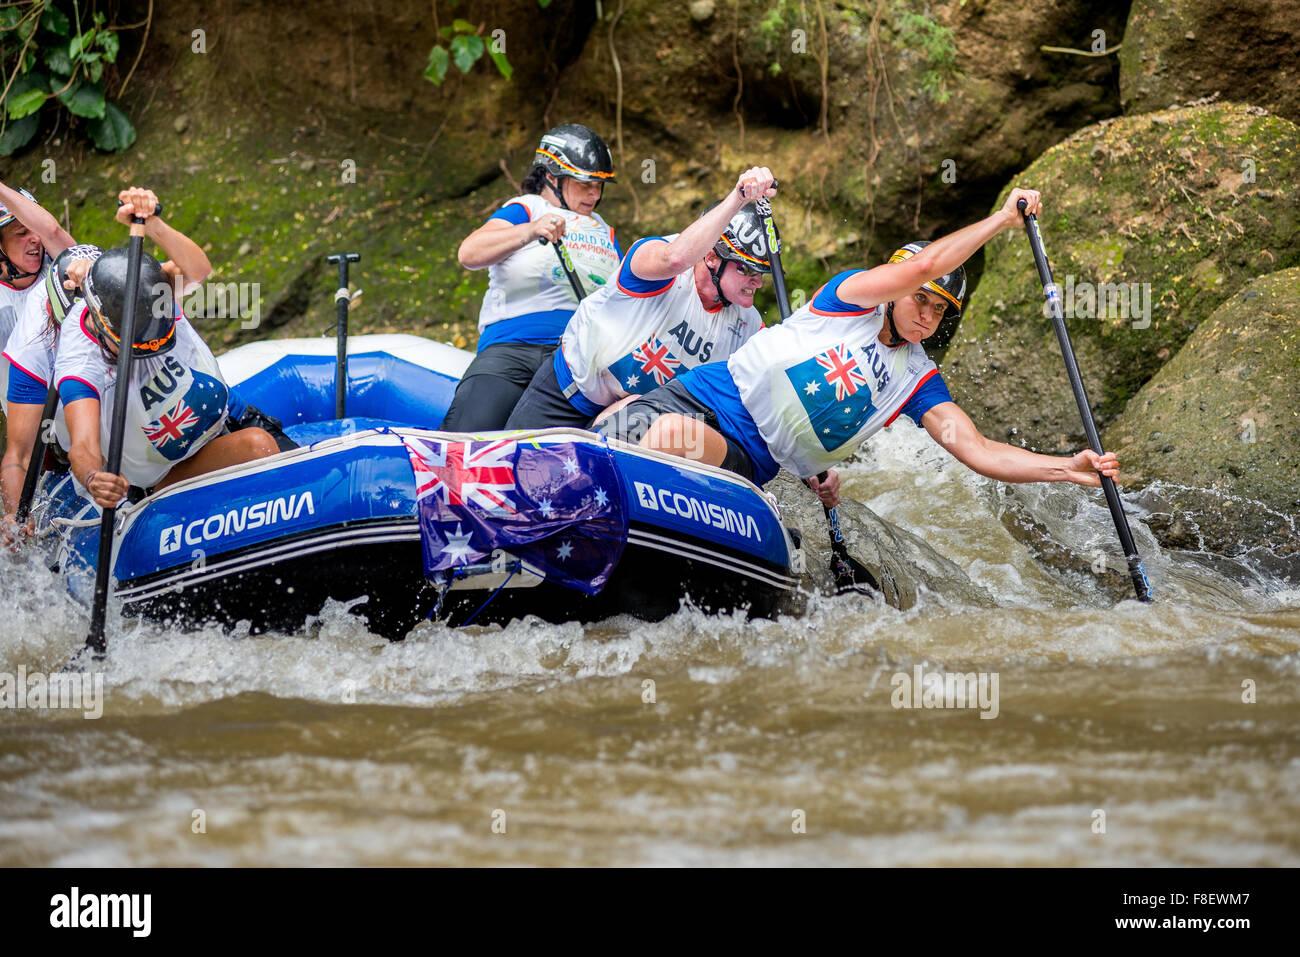 Australian open, Frauen Team beim Sprint-Rennen-Kategorie auf Rafting-Weltmeisterschaft 2015. Stockbild